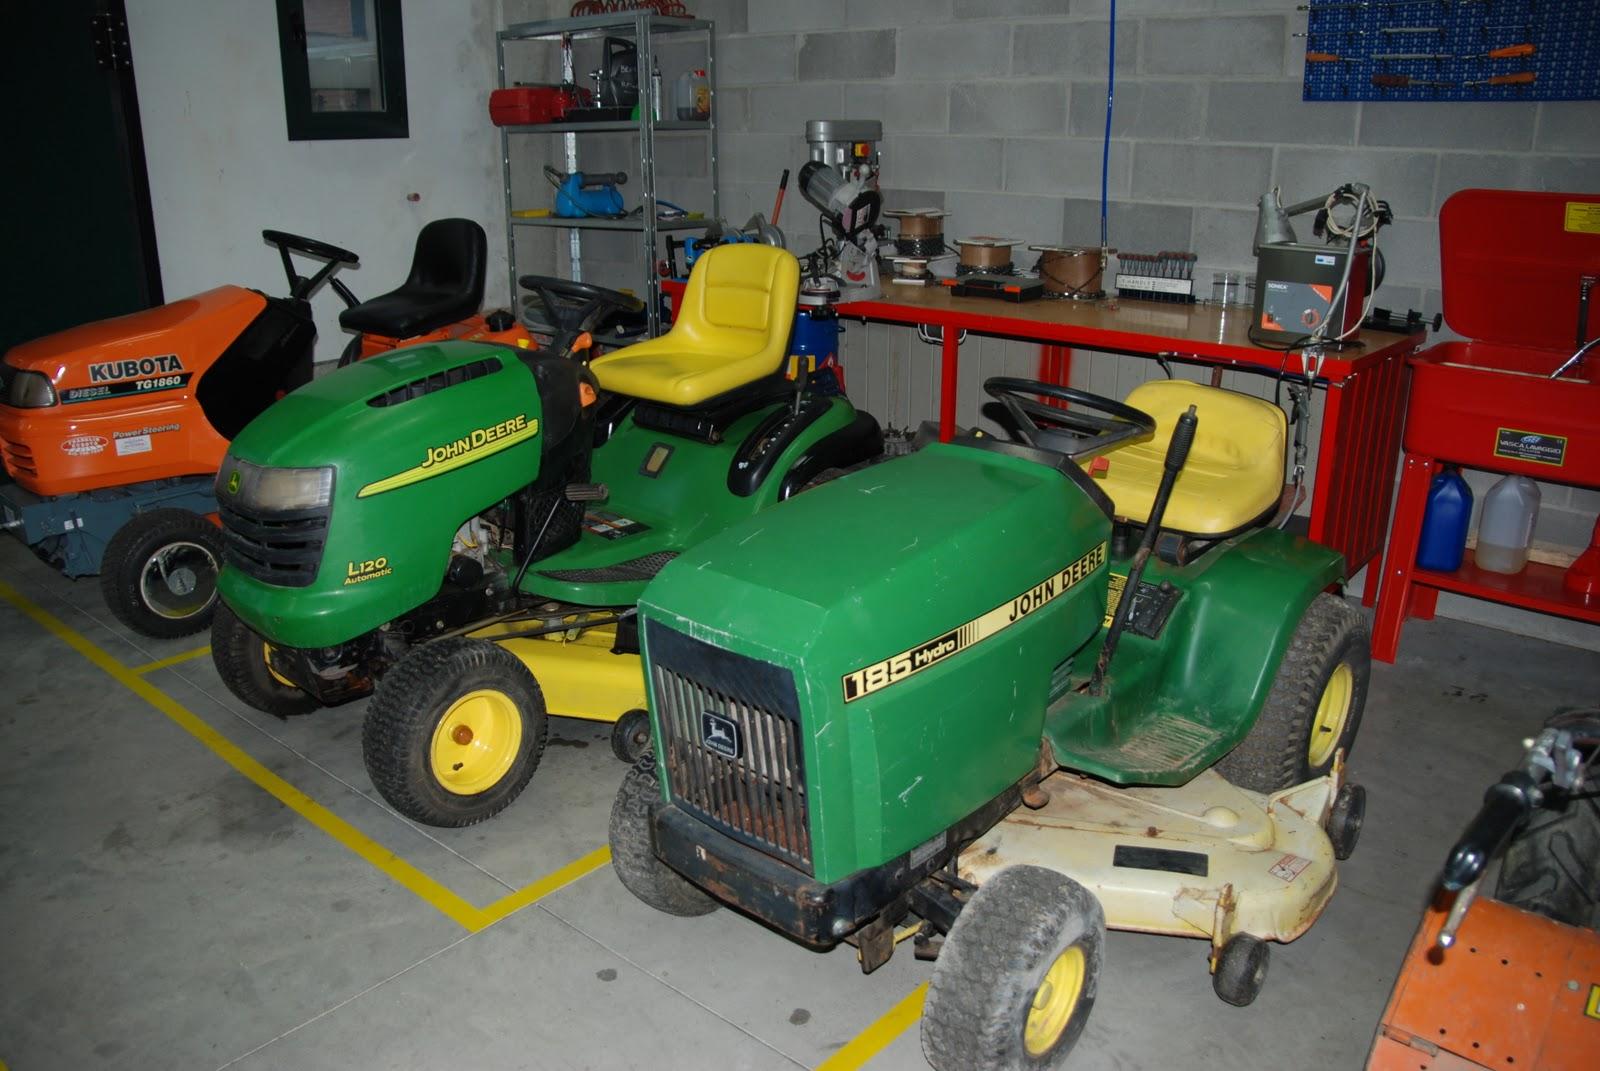 Trattorini john deere rasaerba trattori usati holidays oo for Giaccio trattori